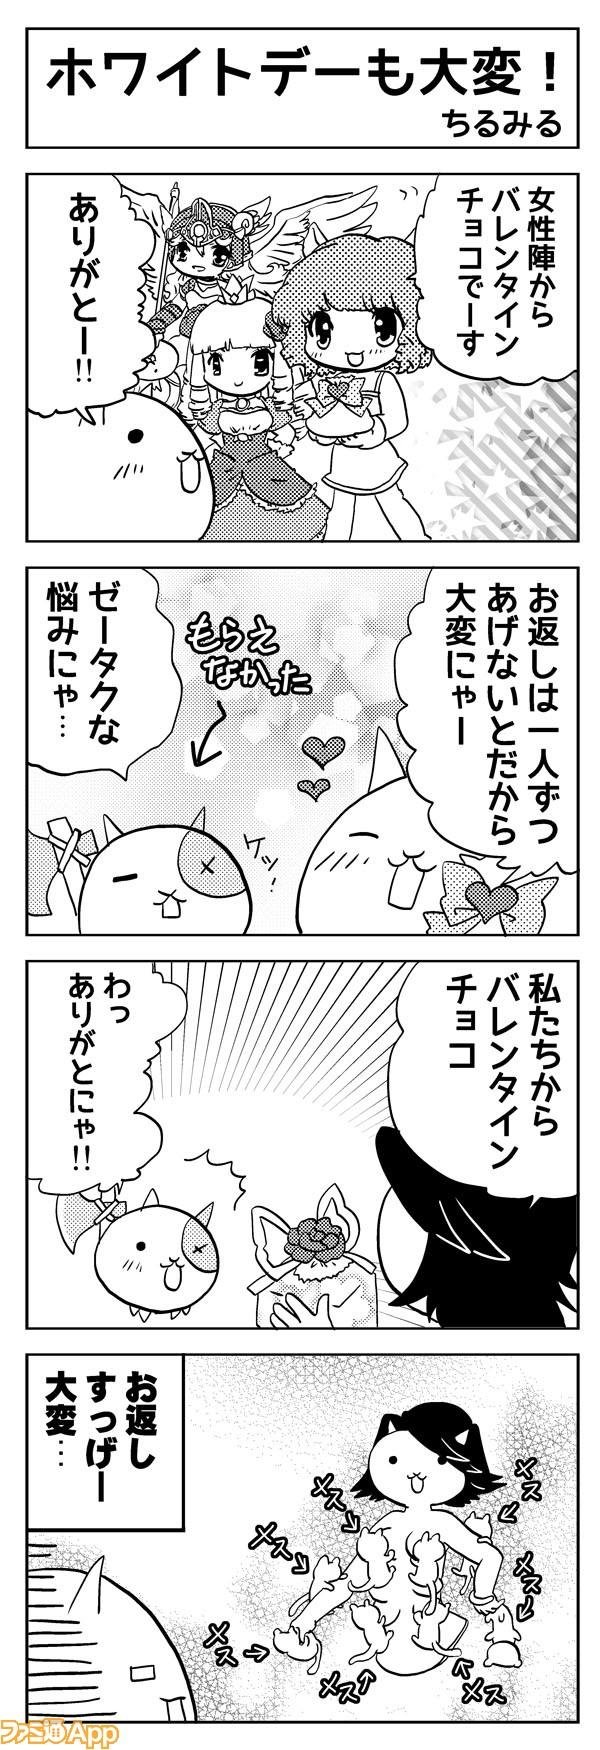 12chiru_007